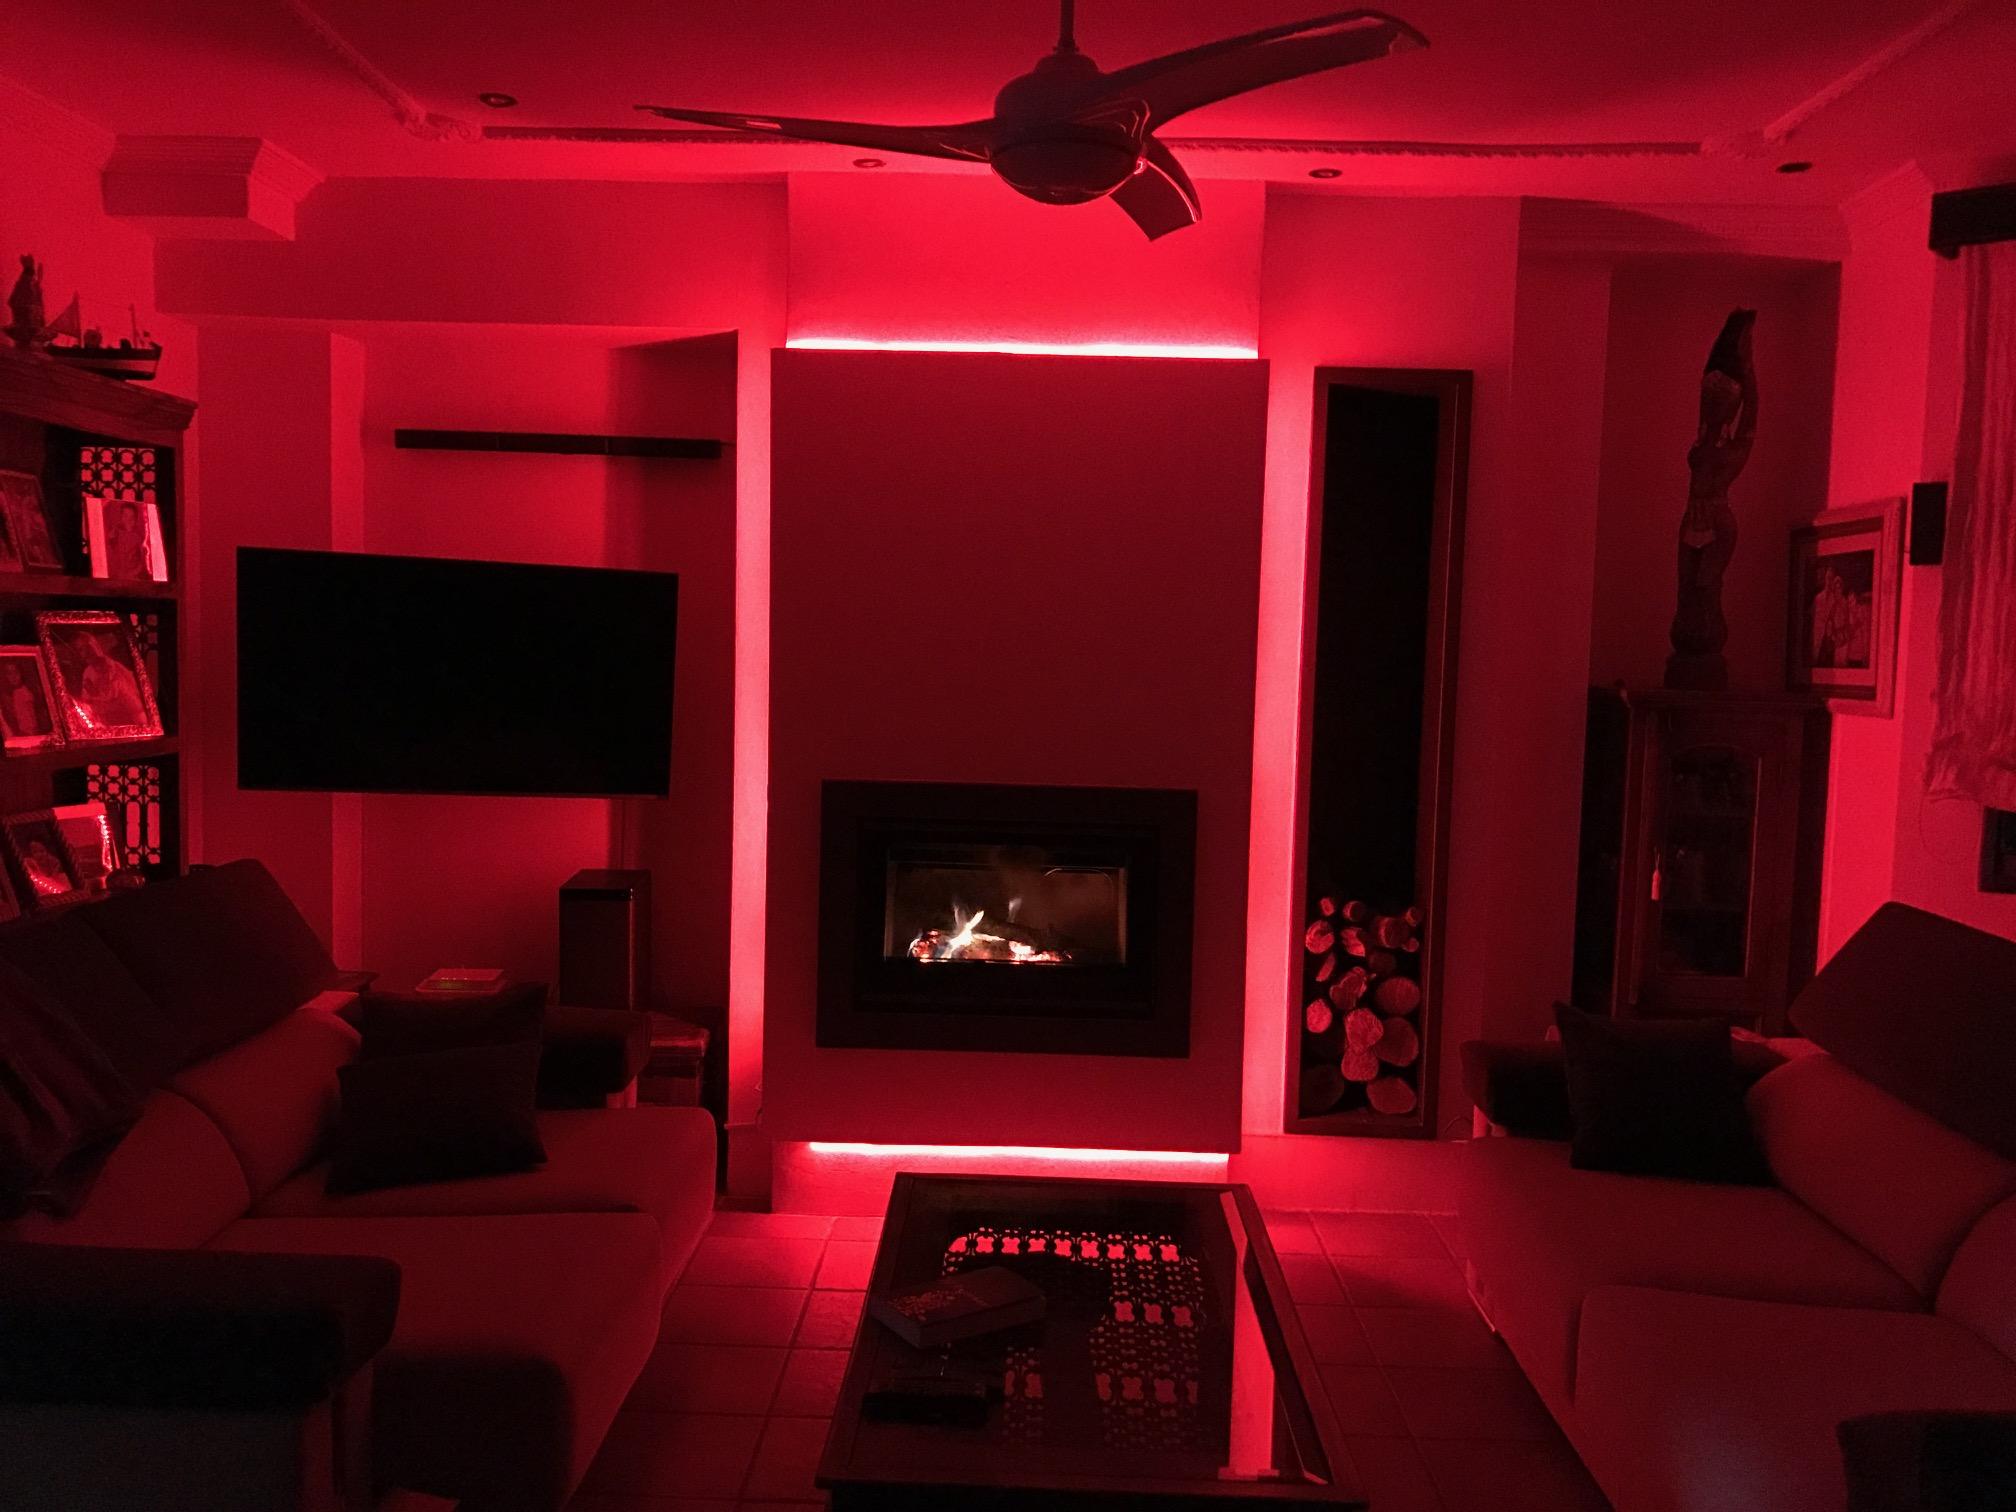 chimenea lea con iluminacin leds chimeneas molina venta e instalacin de estufas de lea y pellet